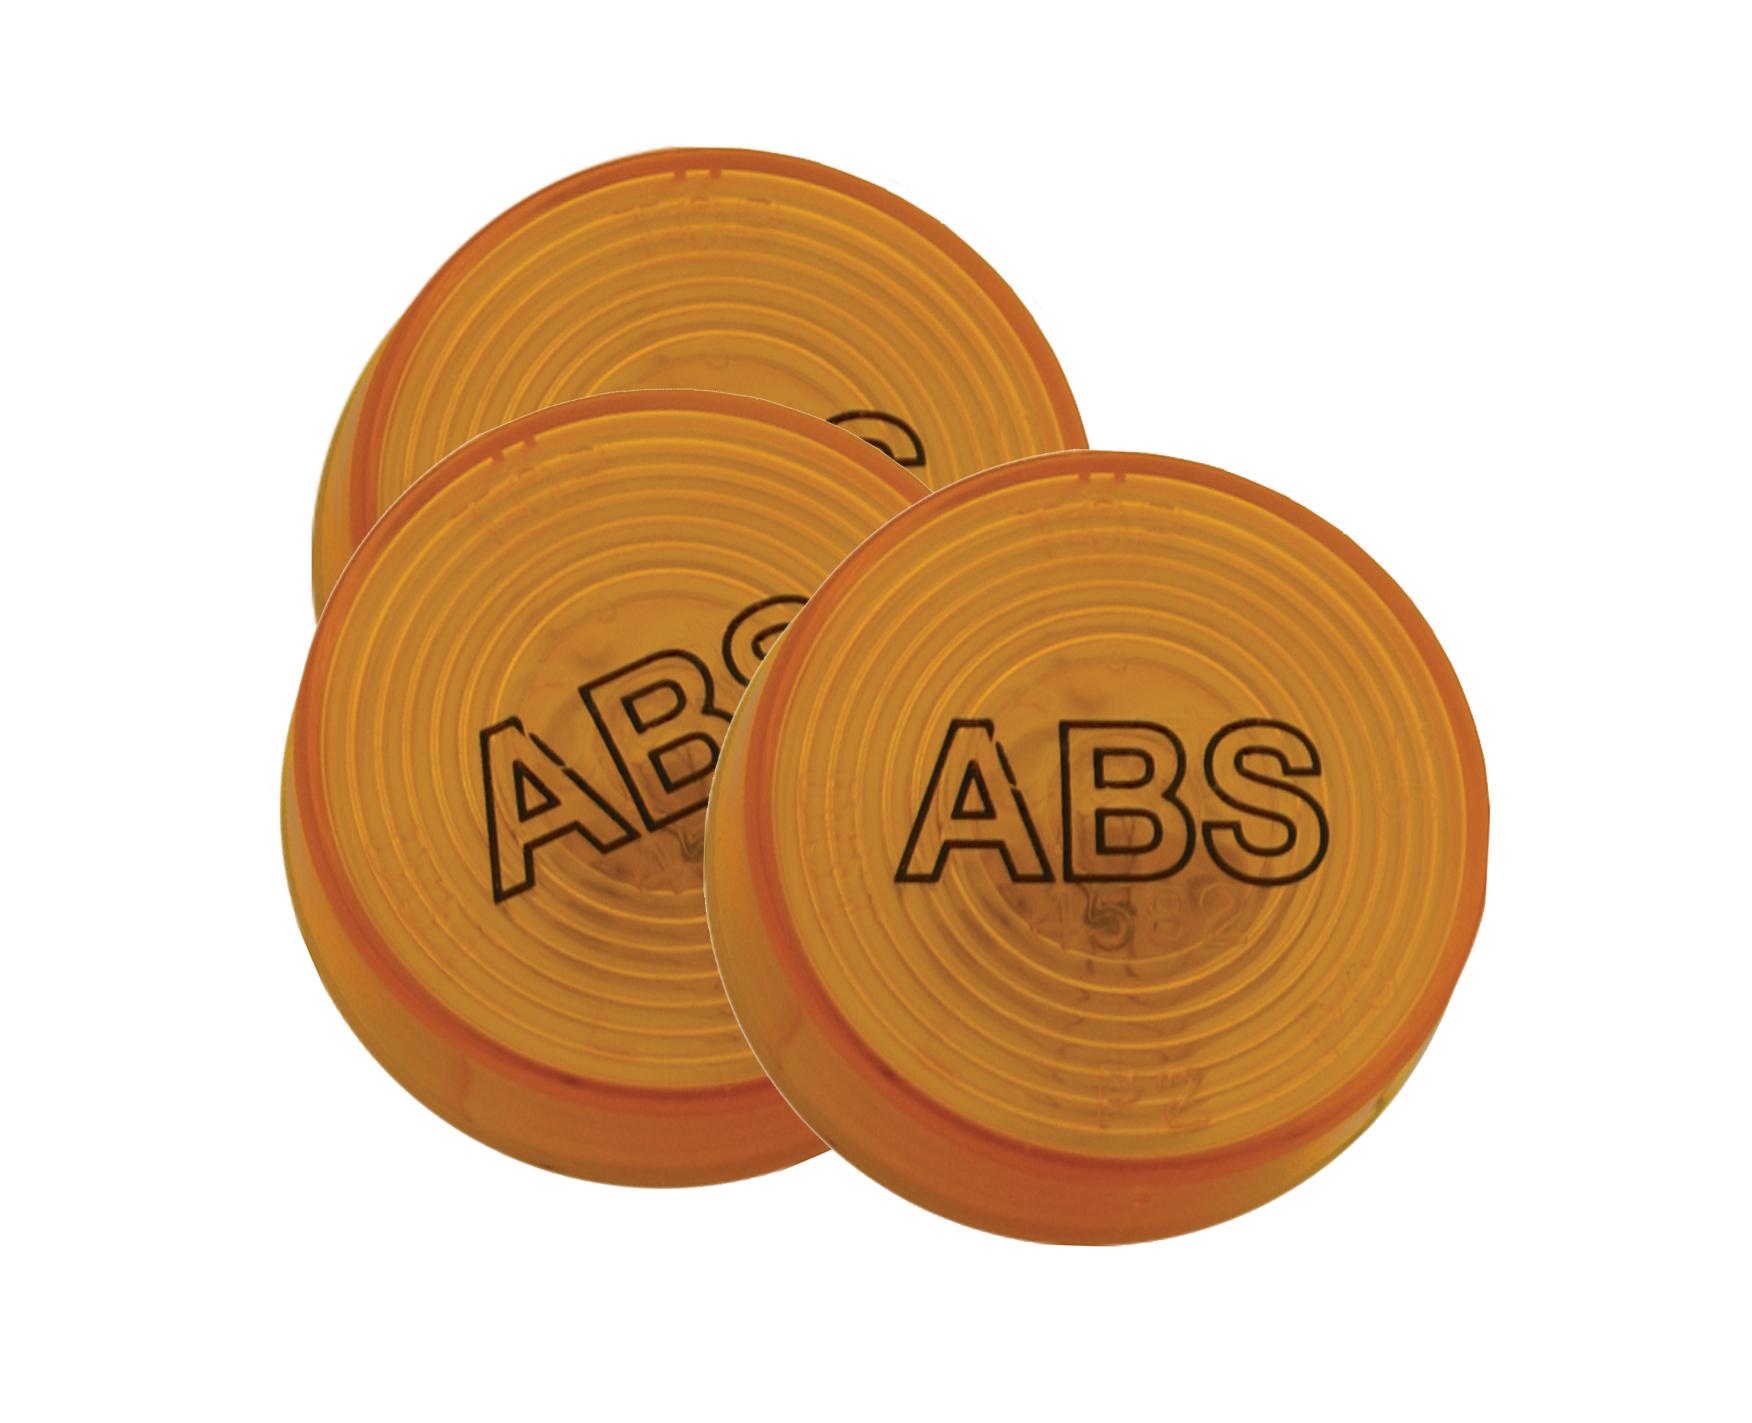 78333-3 – 2″ Clearance Marker Lights, ABS, Yellow, Bulk Pack